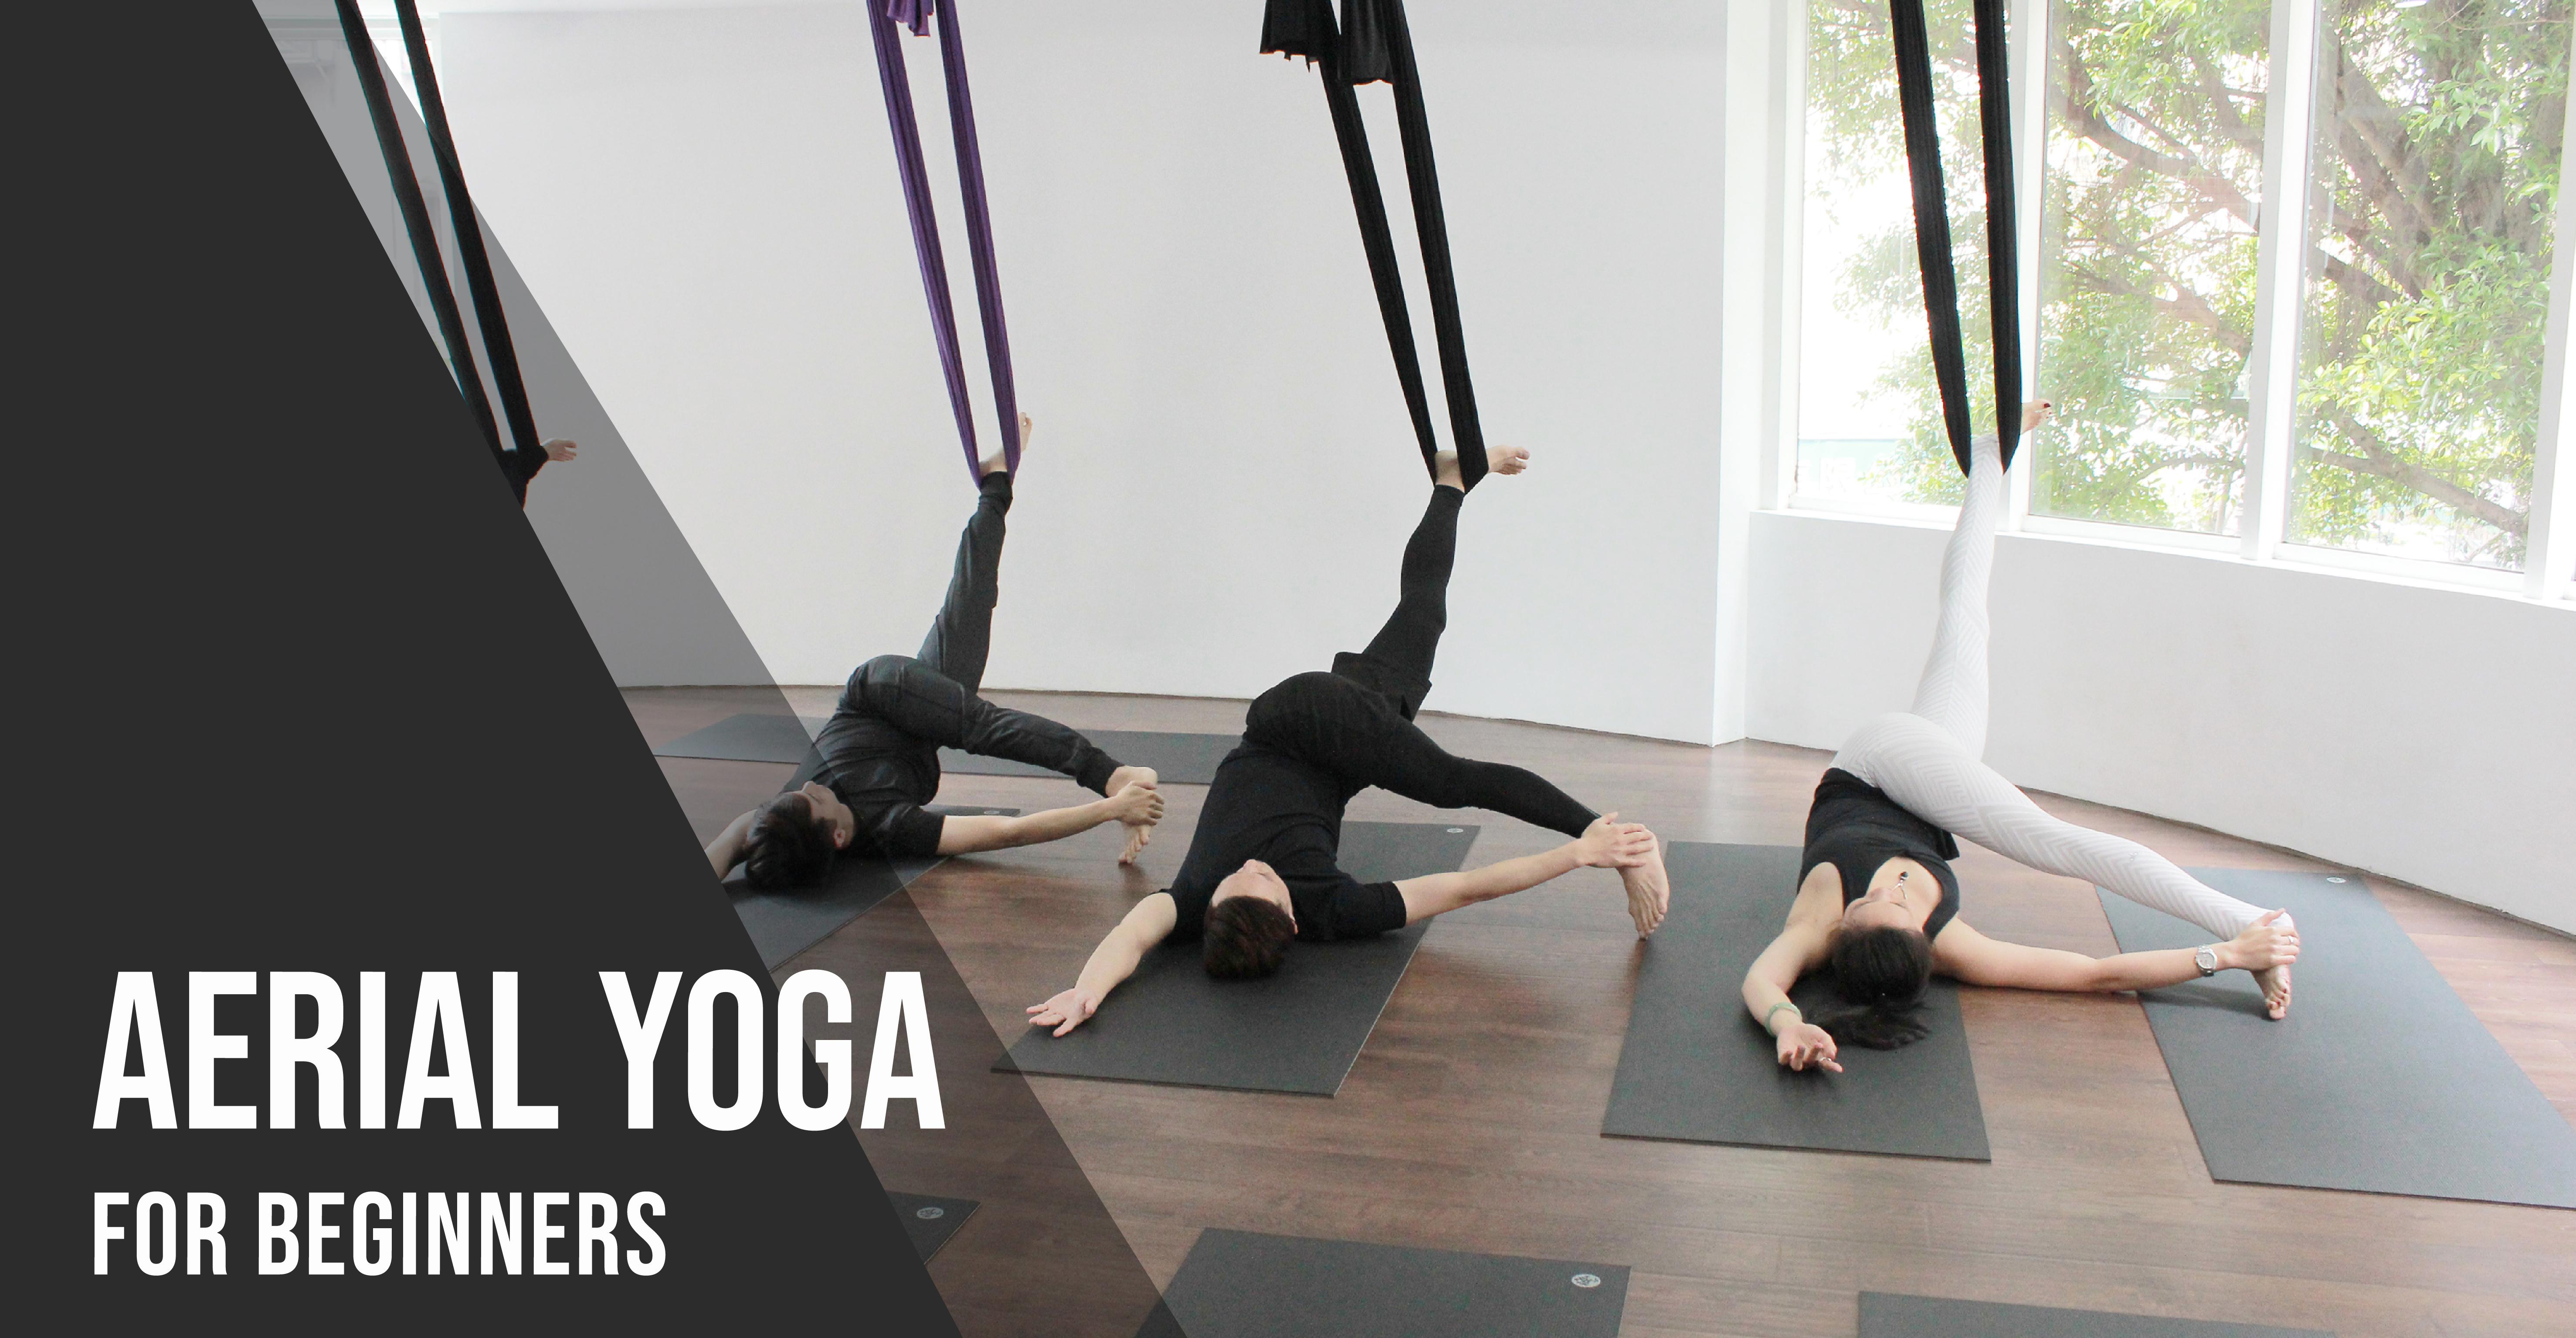 YOGA JOURNEY 瑜珈旅程 - 空中瑜珈